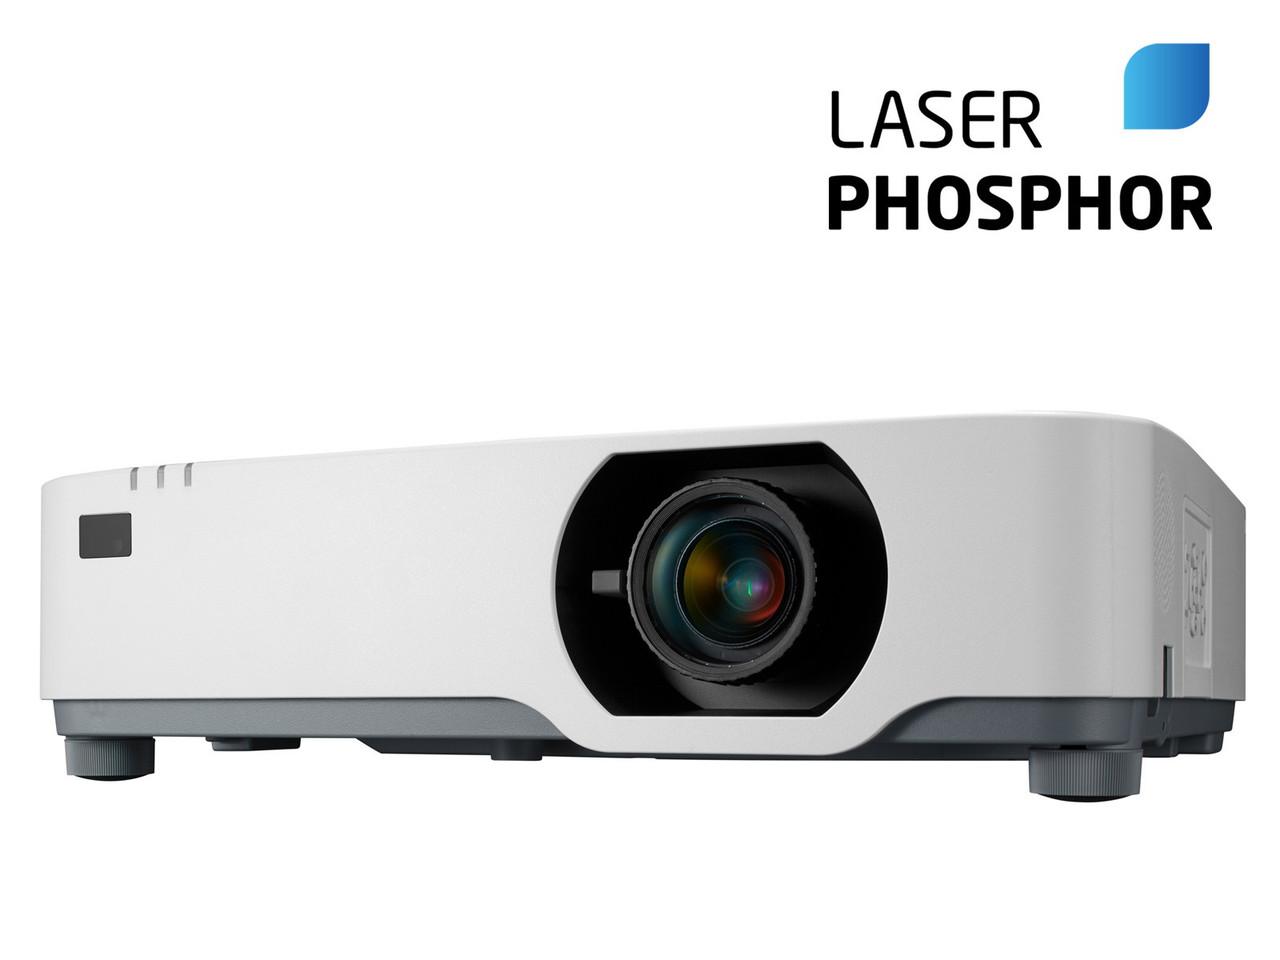 NEC PE455ULG 4500 Lumen WUXGA Professional Laser Projector